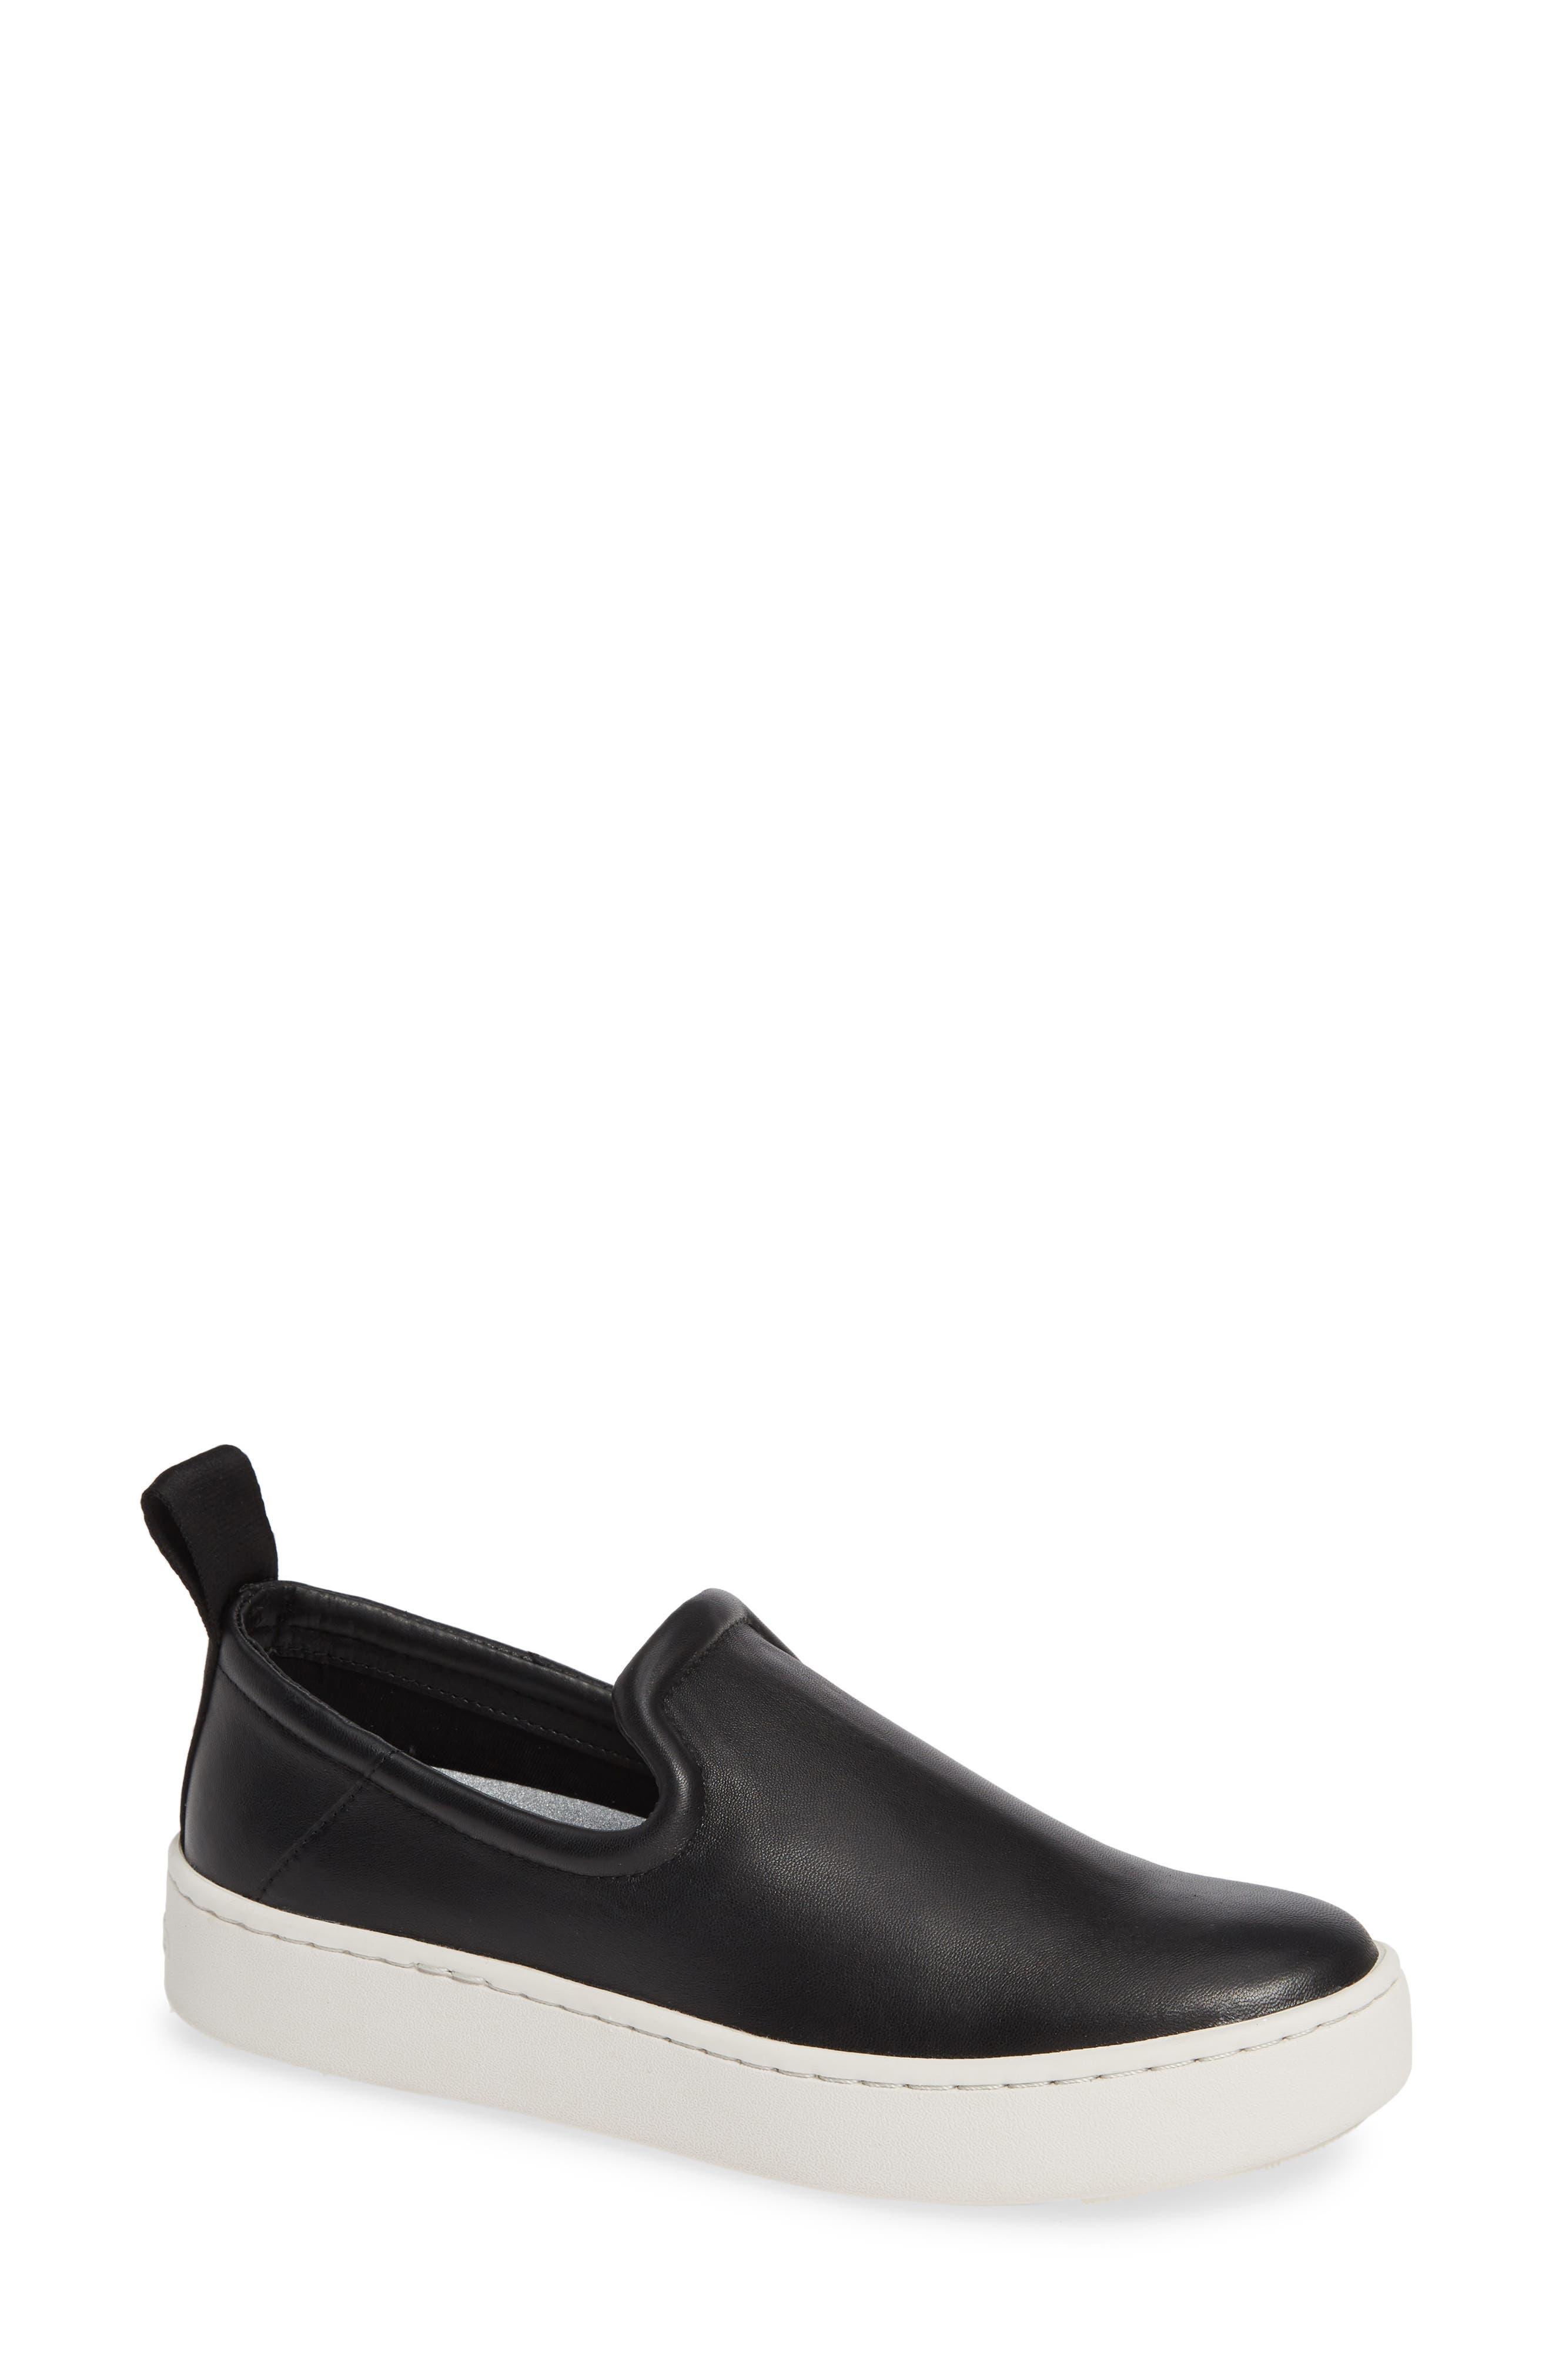 DOLCE VITA Tag Slip-On Sneaker, Main, color, BLACK LEATHER